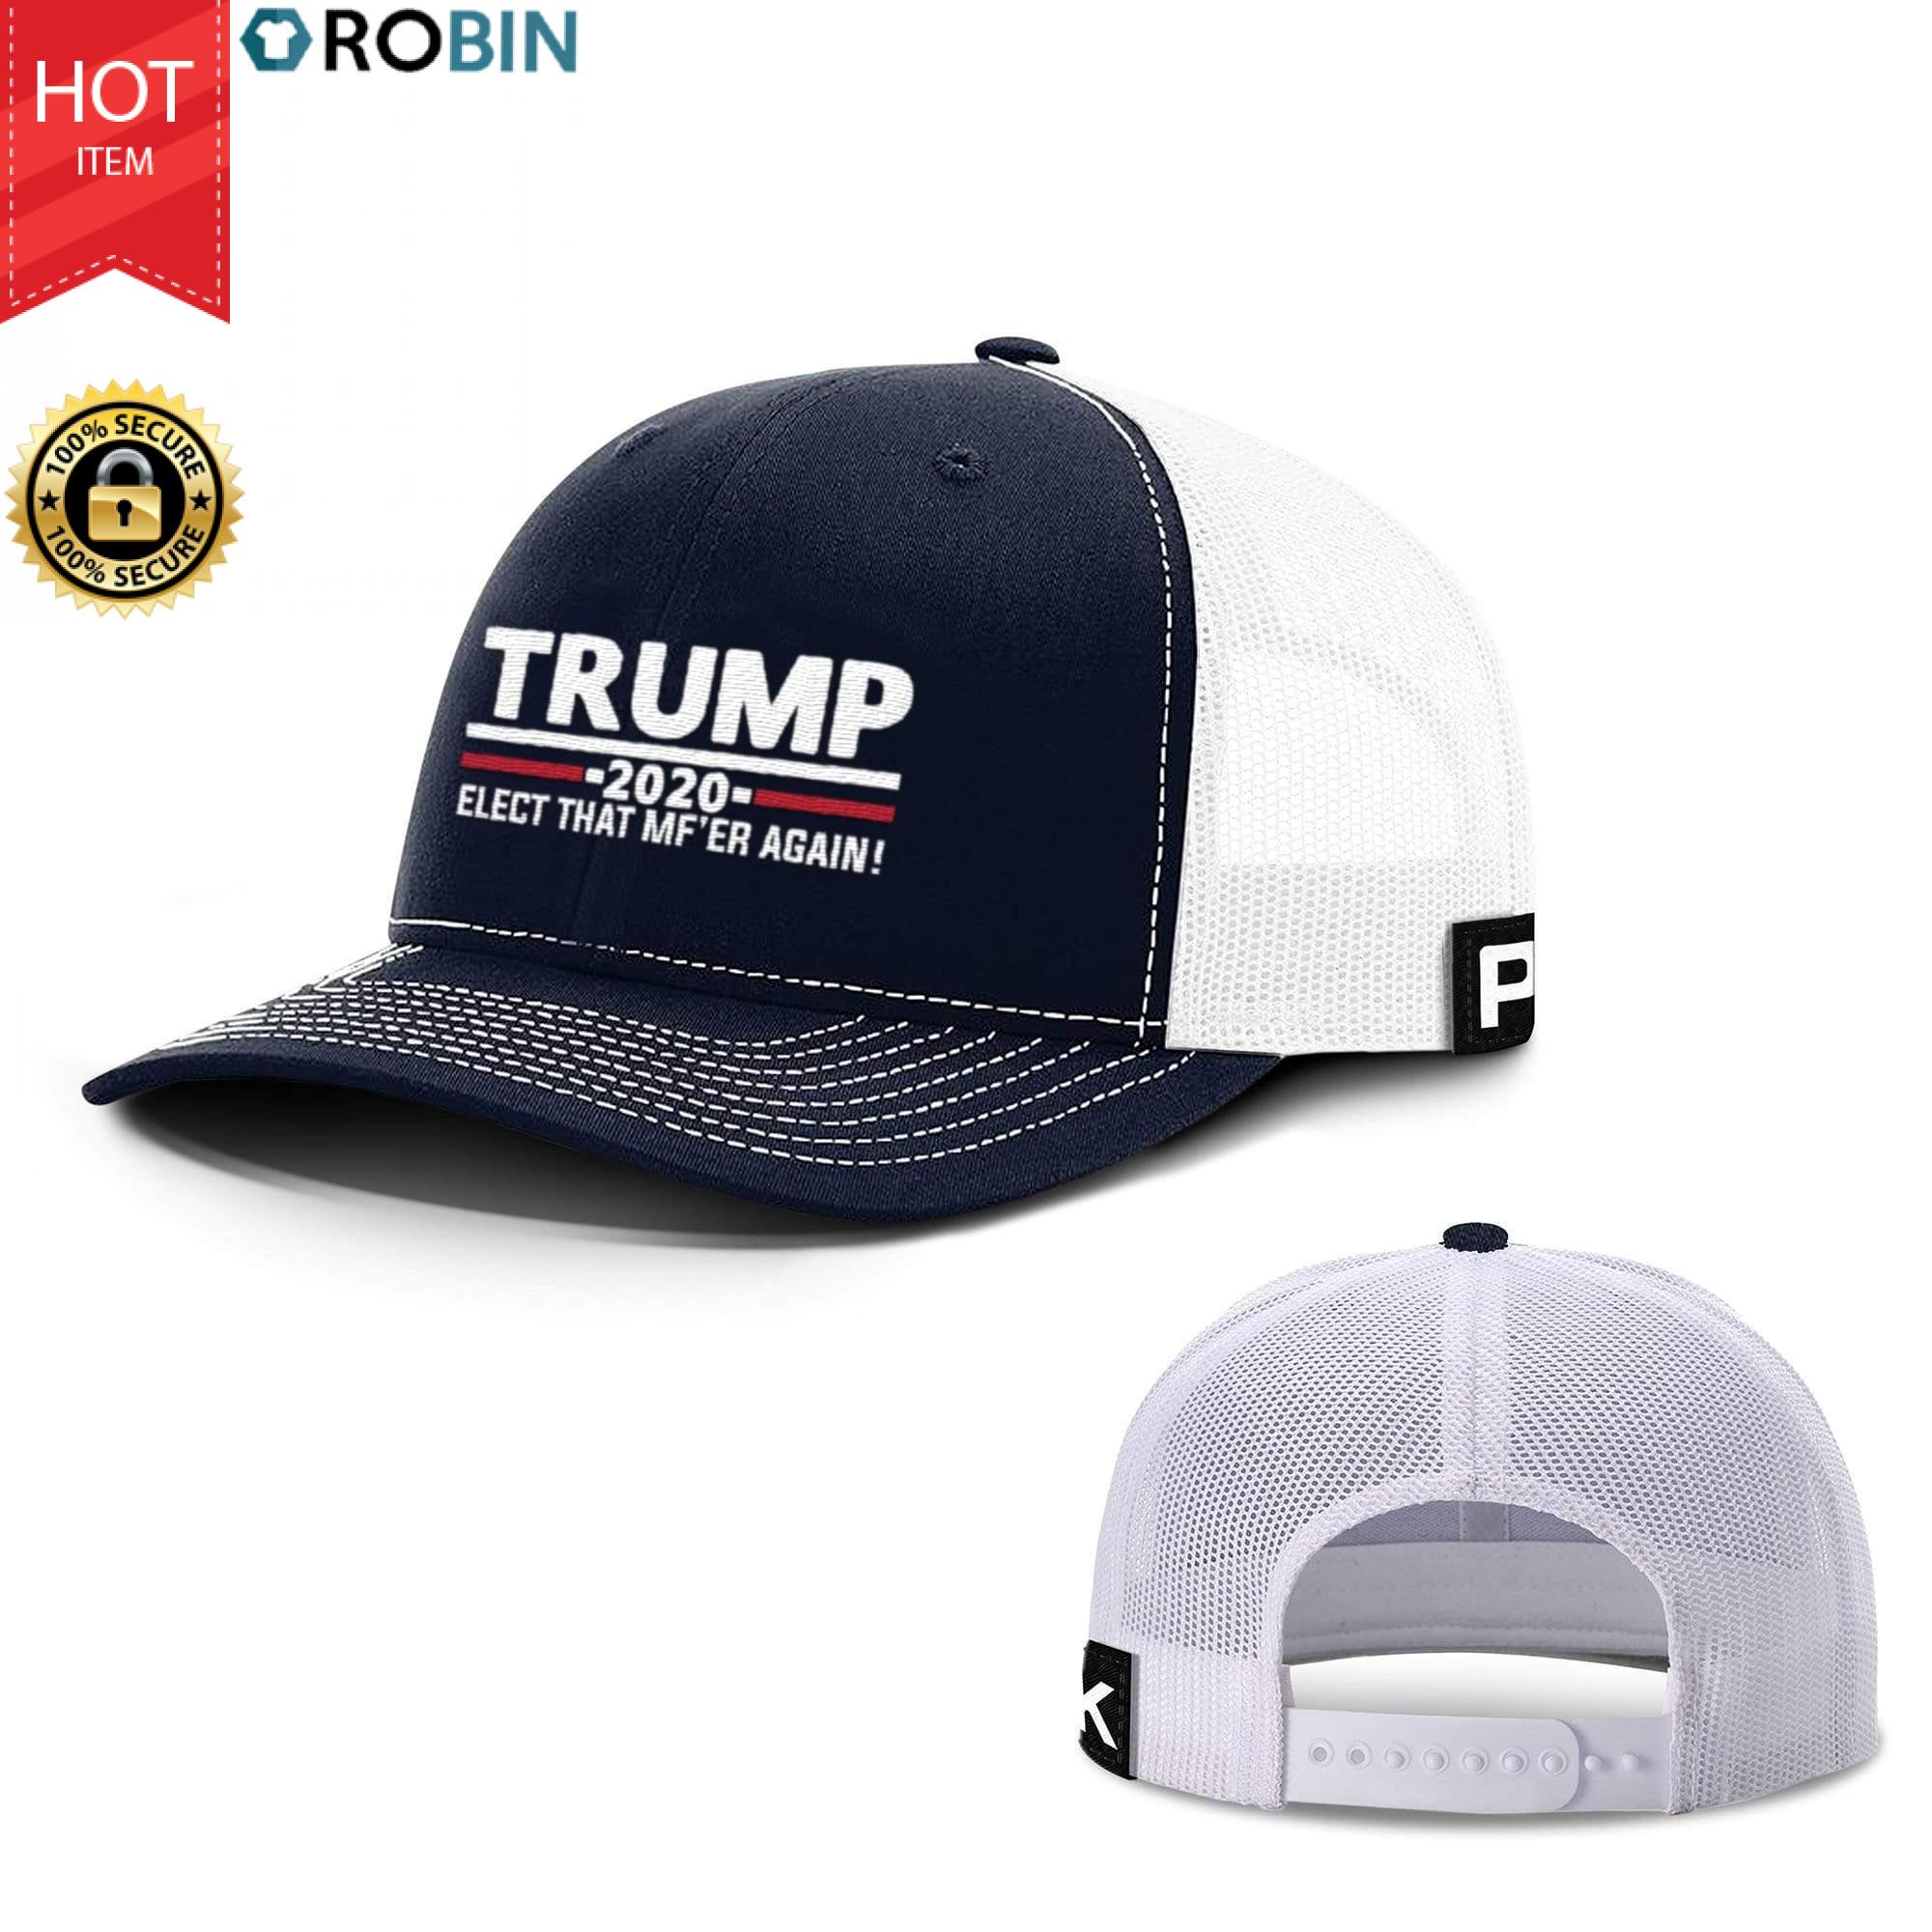 Trump 2020 Back Mesh Hat